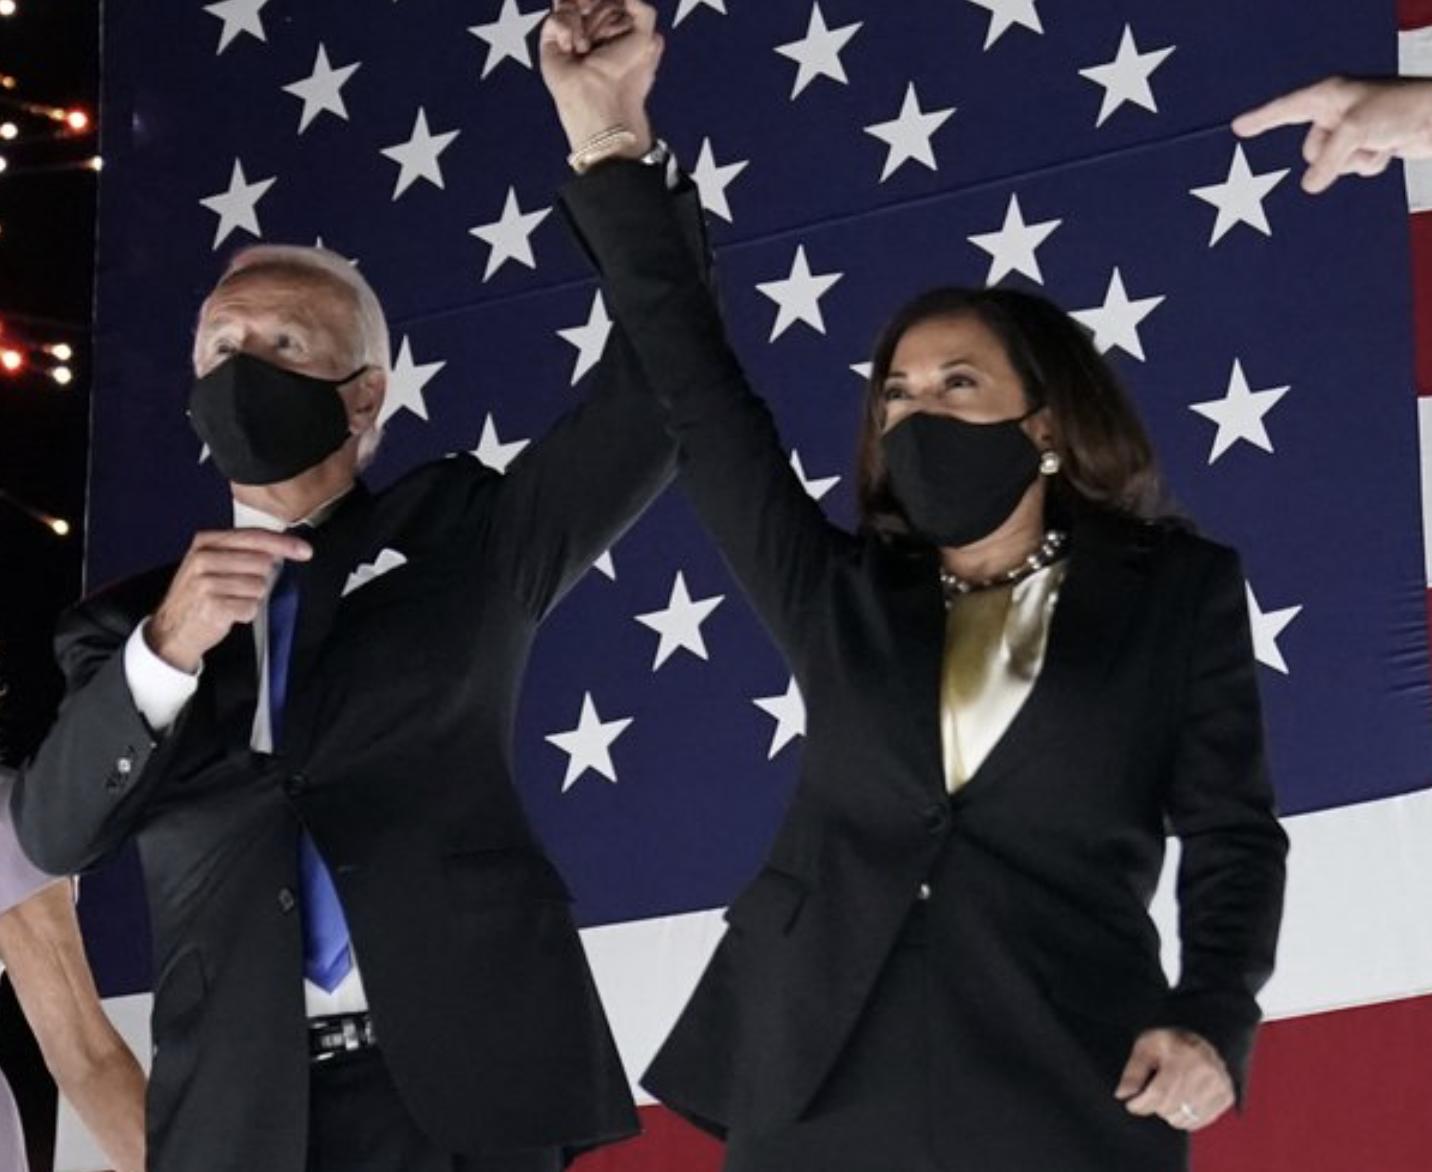 Biden & Harris at the DNC (August 18, 2020)